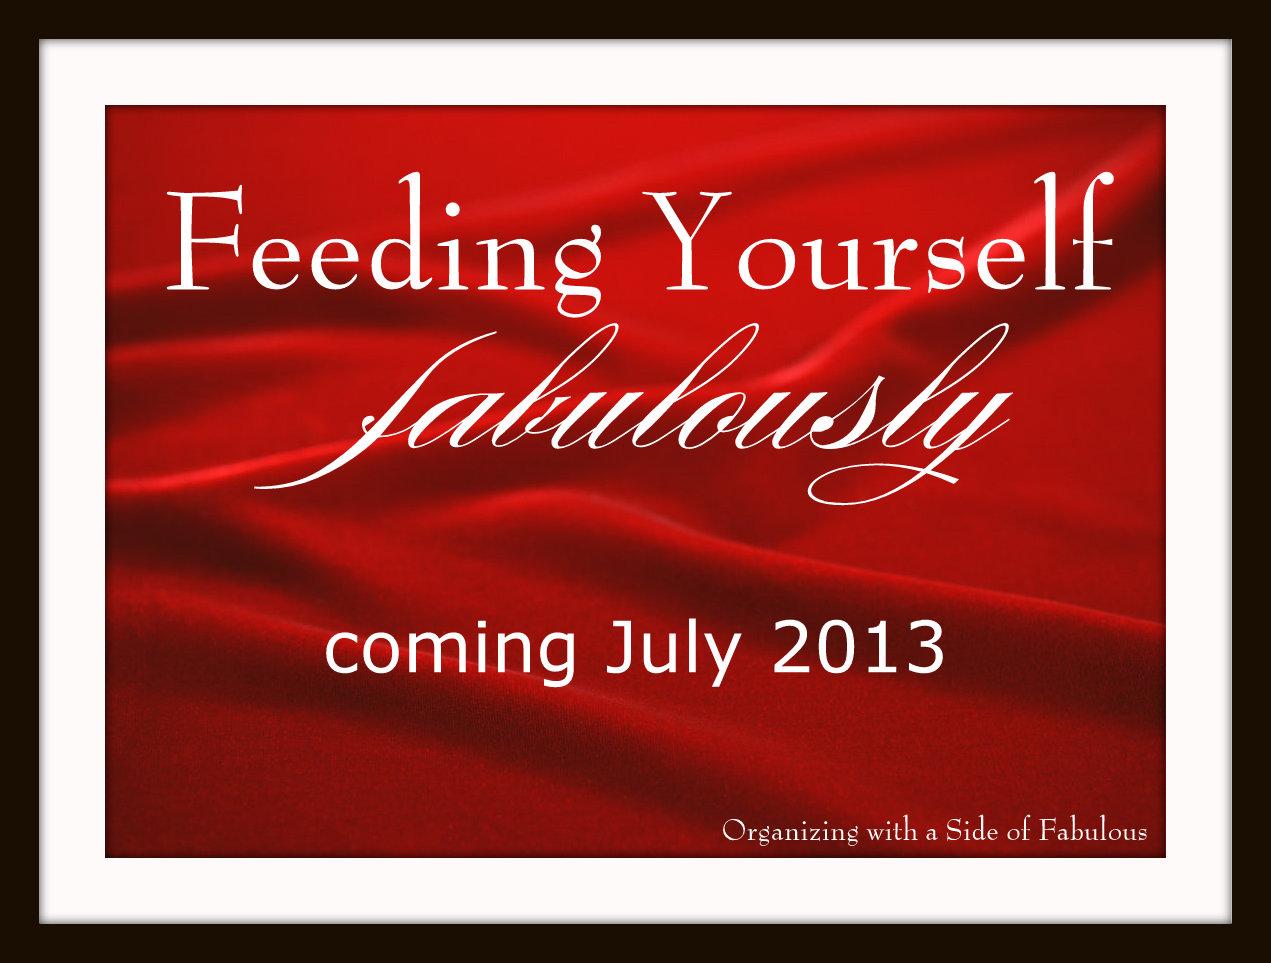 Feeding Yourself Fabulously